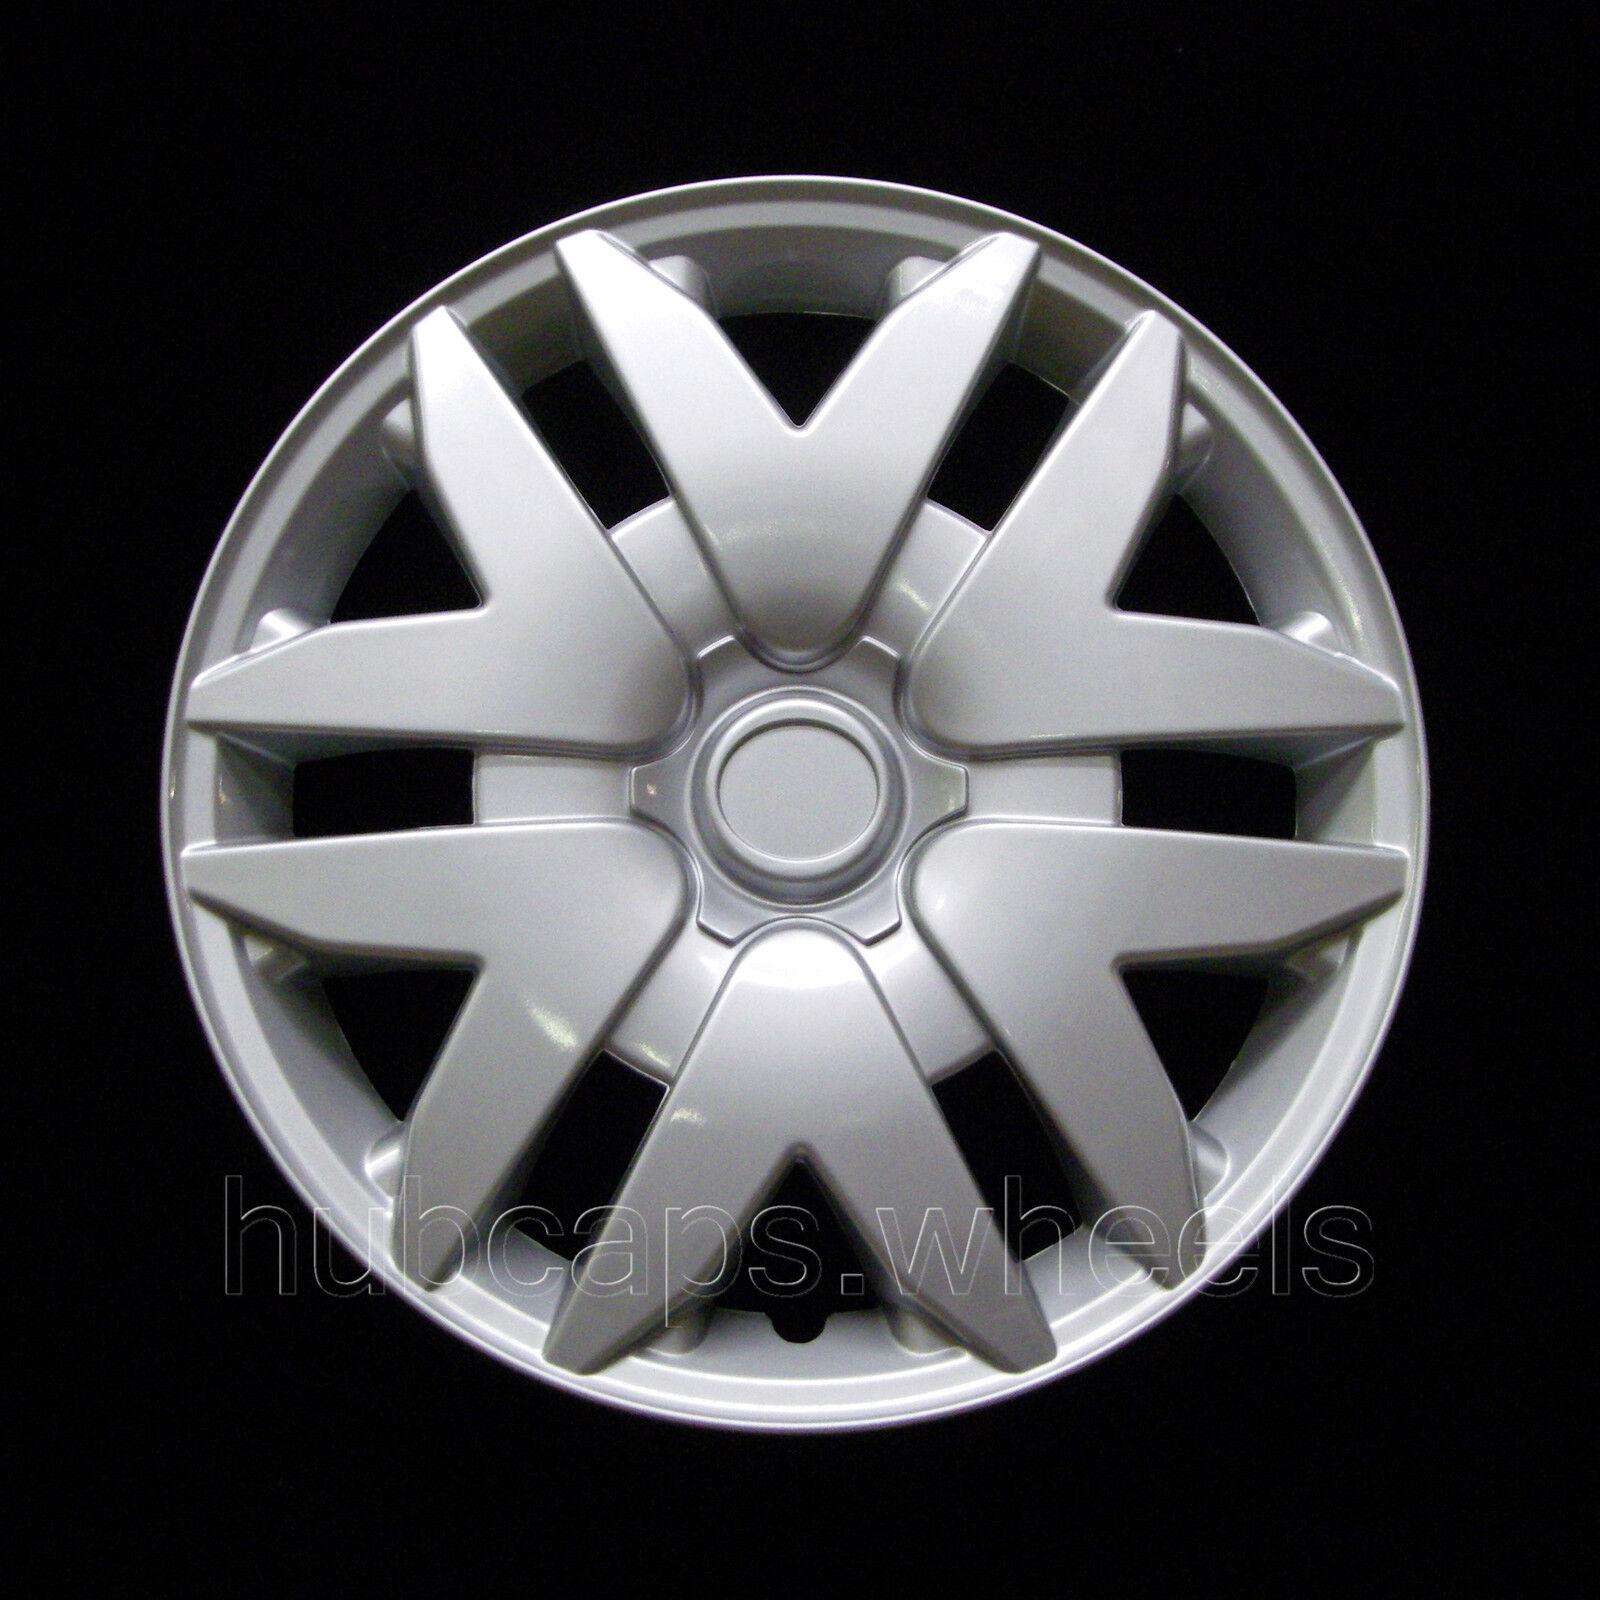 NEW Hubcap for Toyota Sienna 2004-2010 - Premium Replica 16  Wheel Cover 61124